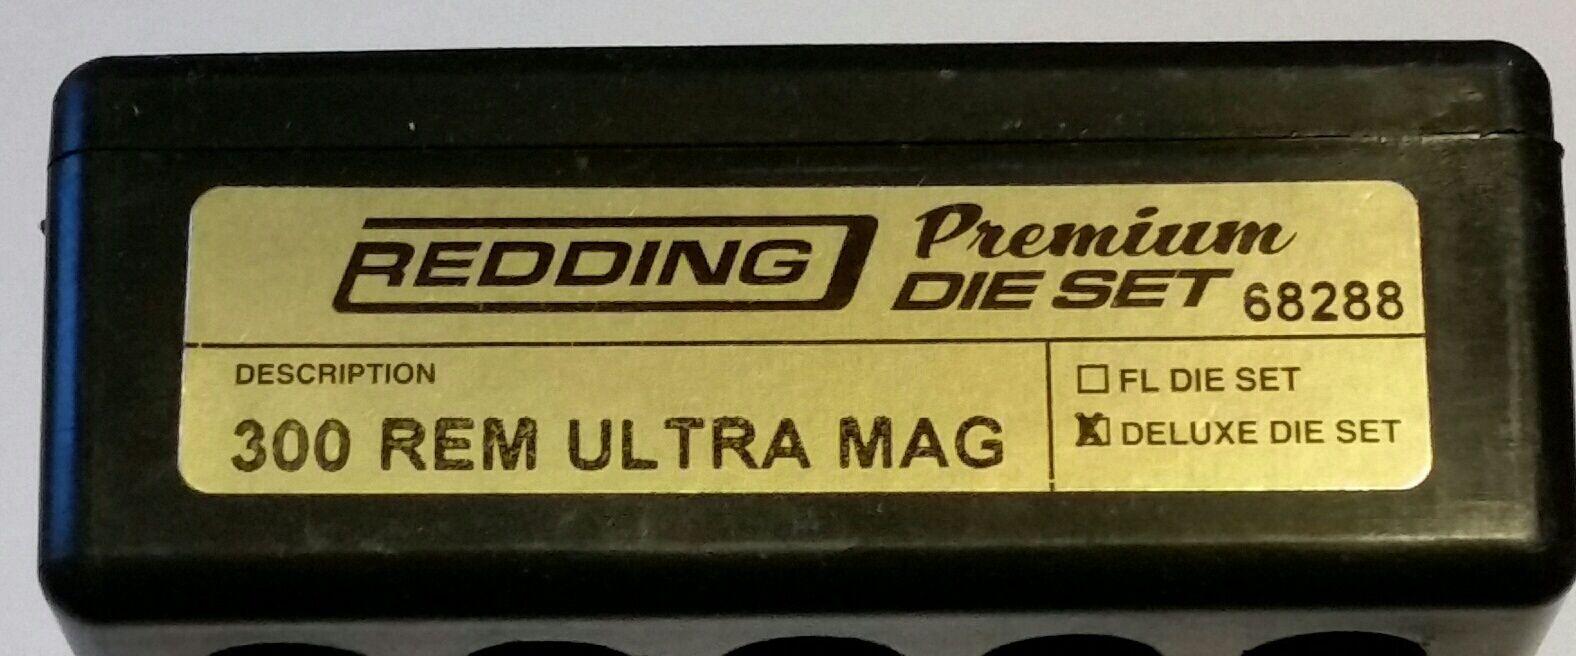 68288 3-DIE Premium De Lujo Cuello De Botella rojoding Set - 300 Rem Mag Ron Ultra-Nuevo